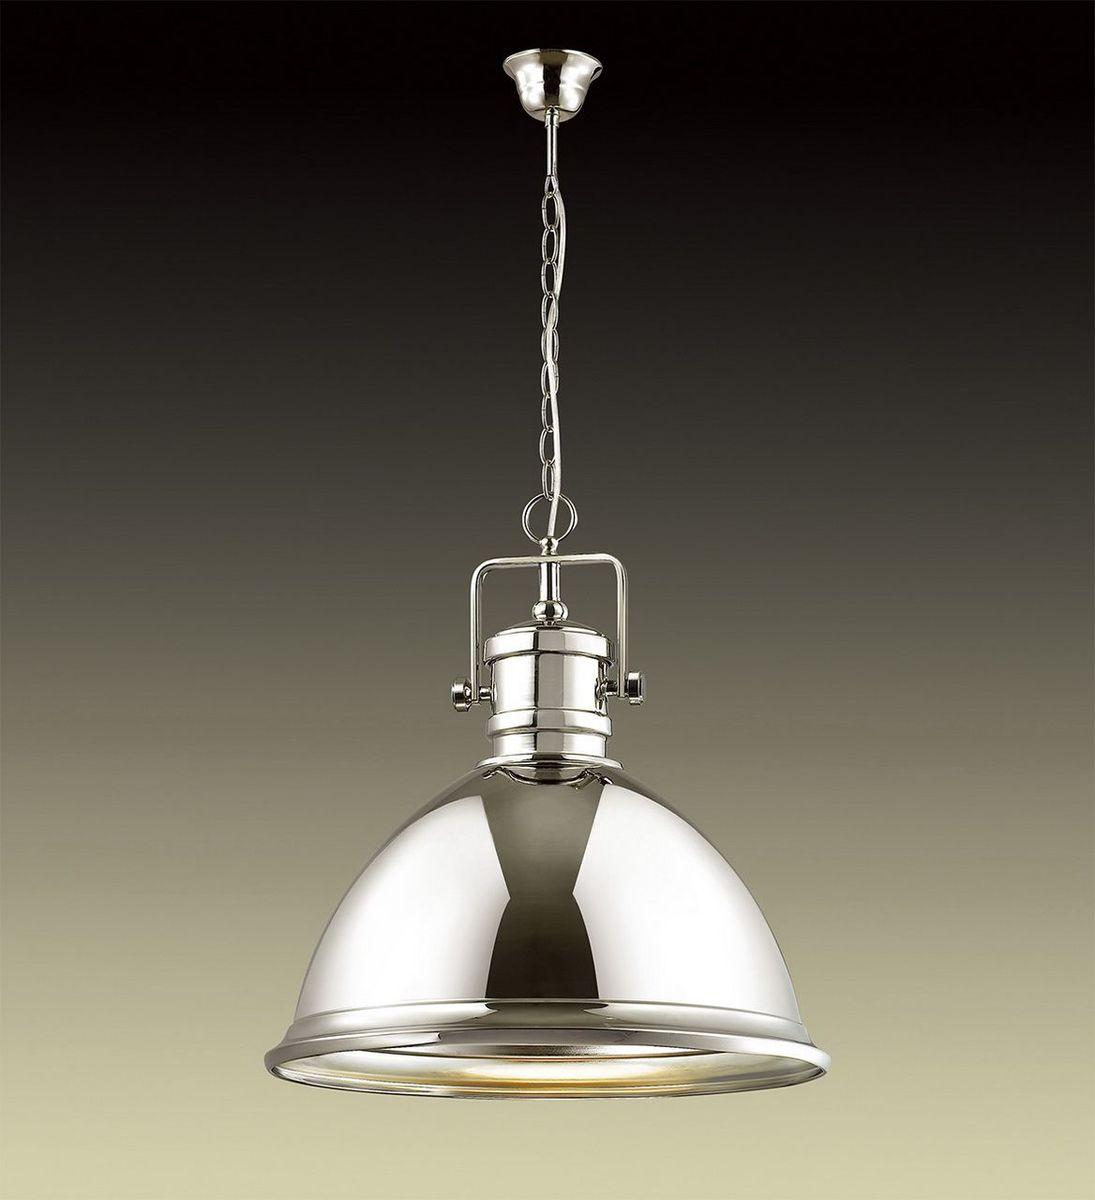 Светильник подвесной Odeon Light Talva, 1 х E27, 60W. 2901/1A2901/1A